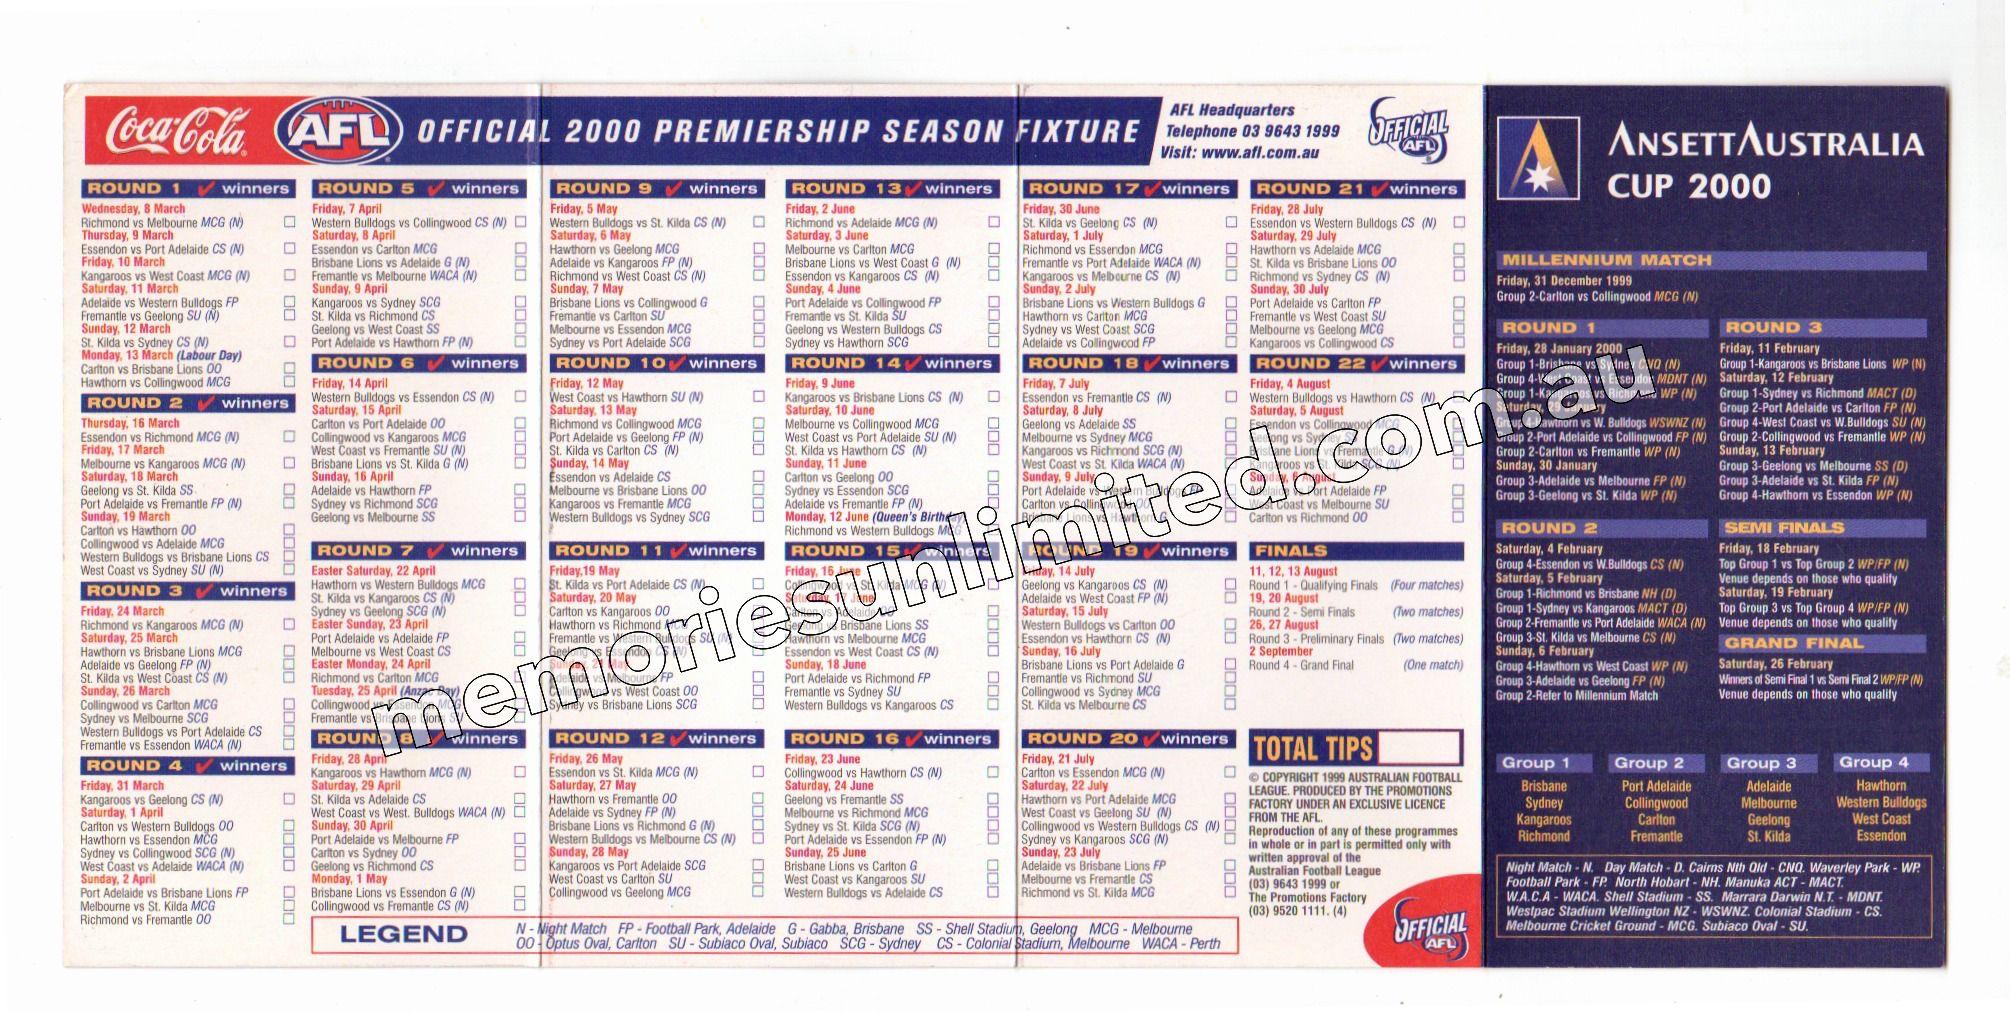 2000 AFL CLUB MEMBERSHIP (2000 AFL FOOTBALL FIXTURE)